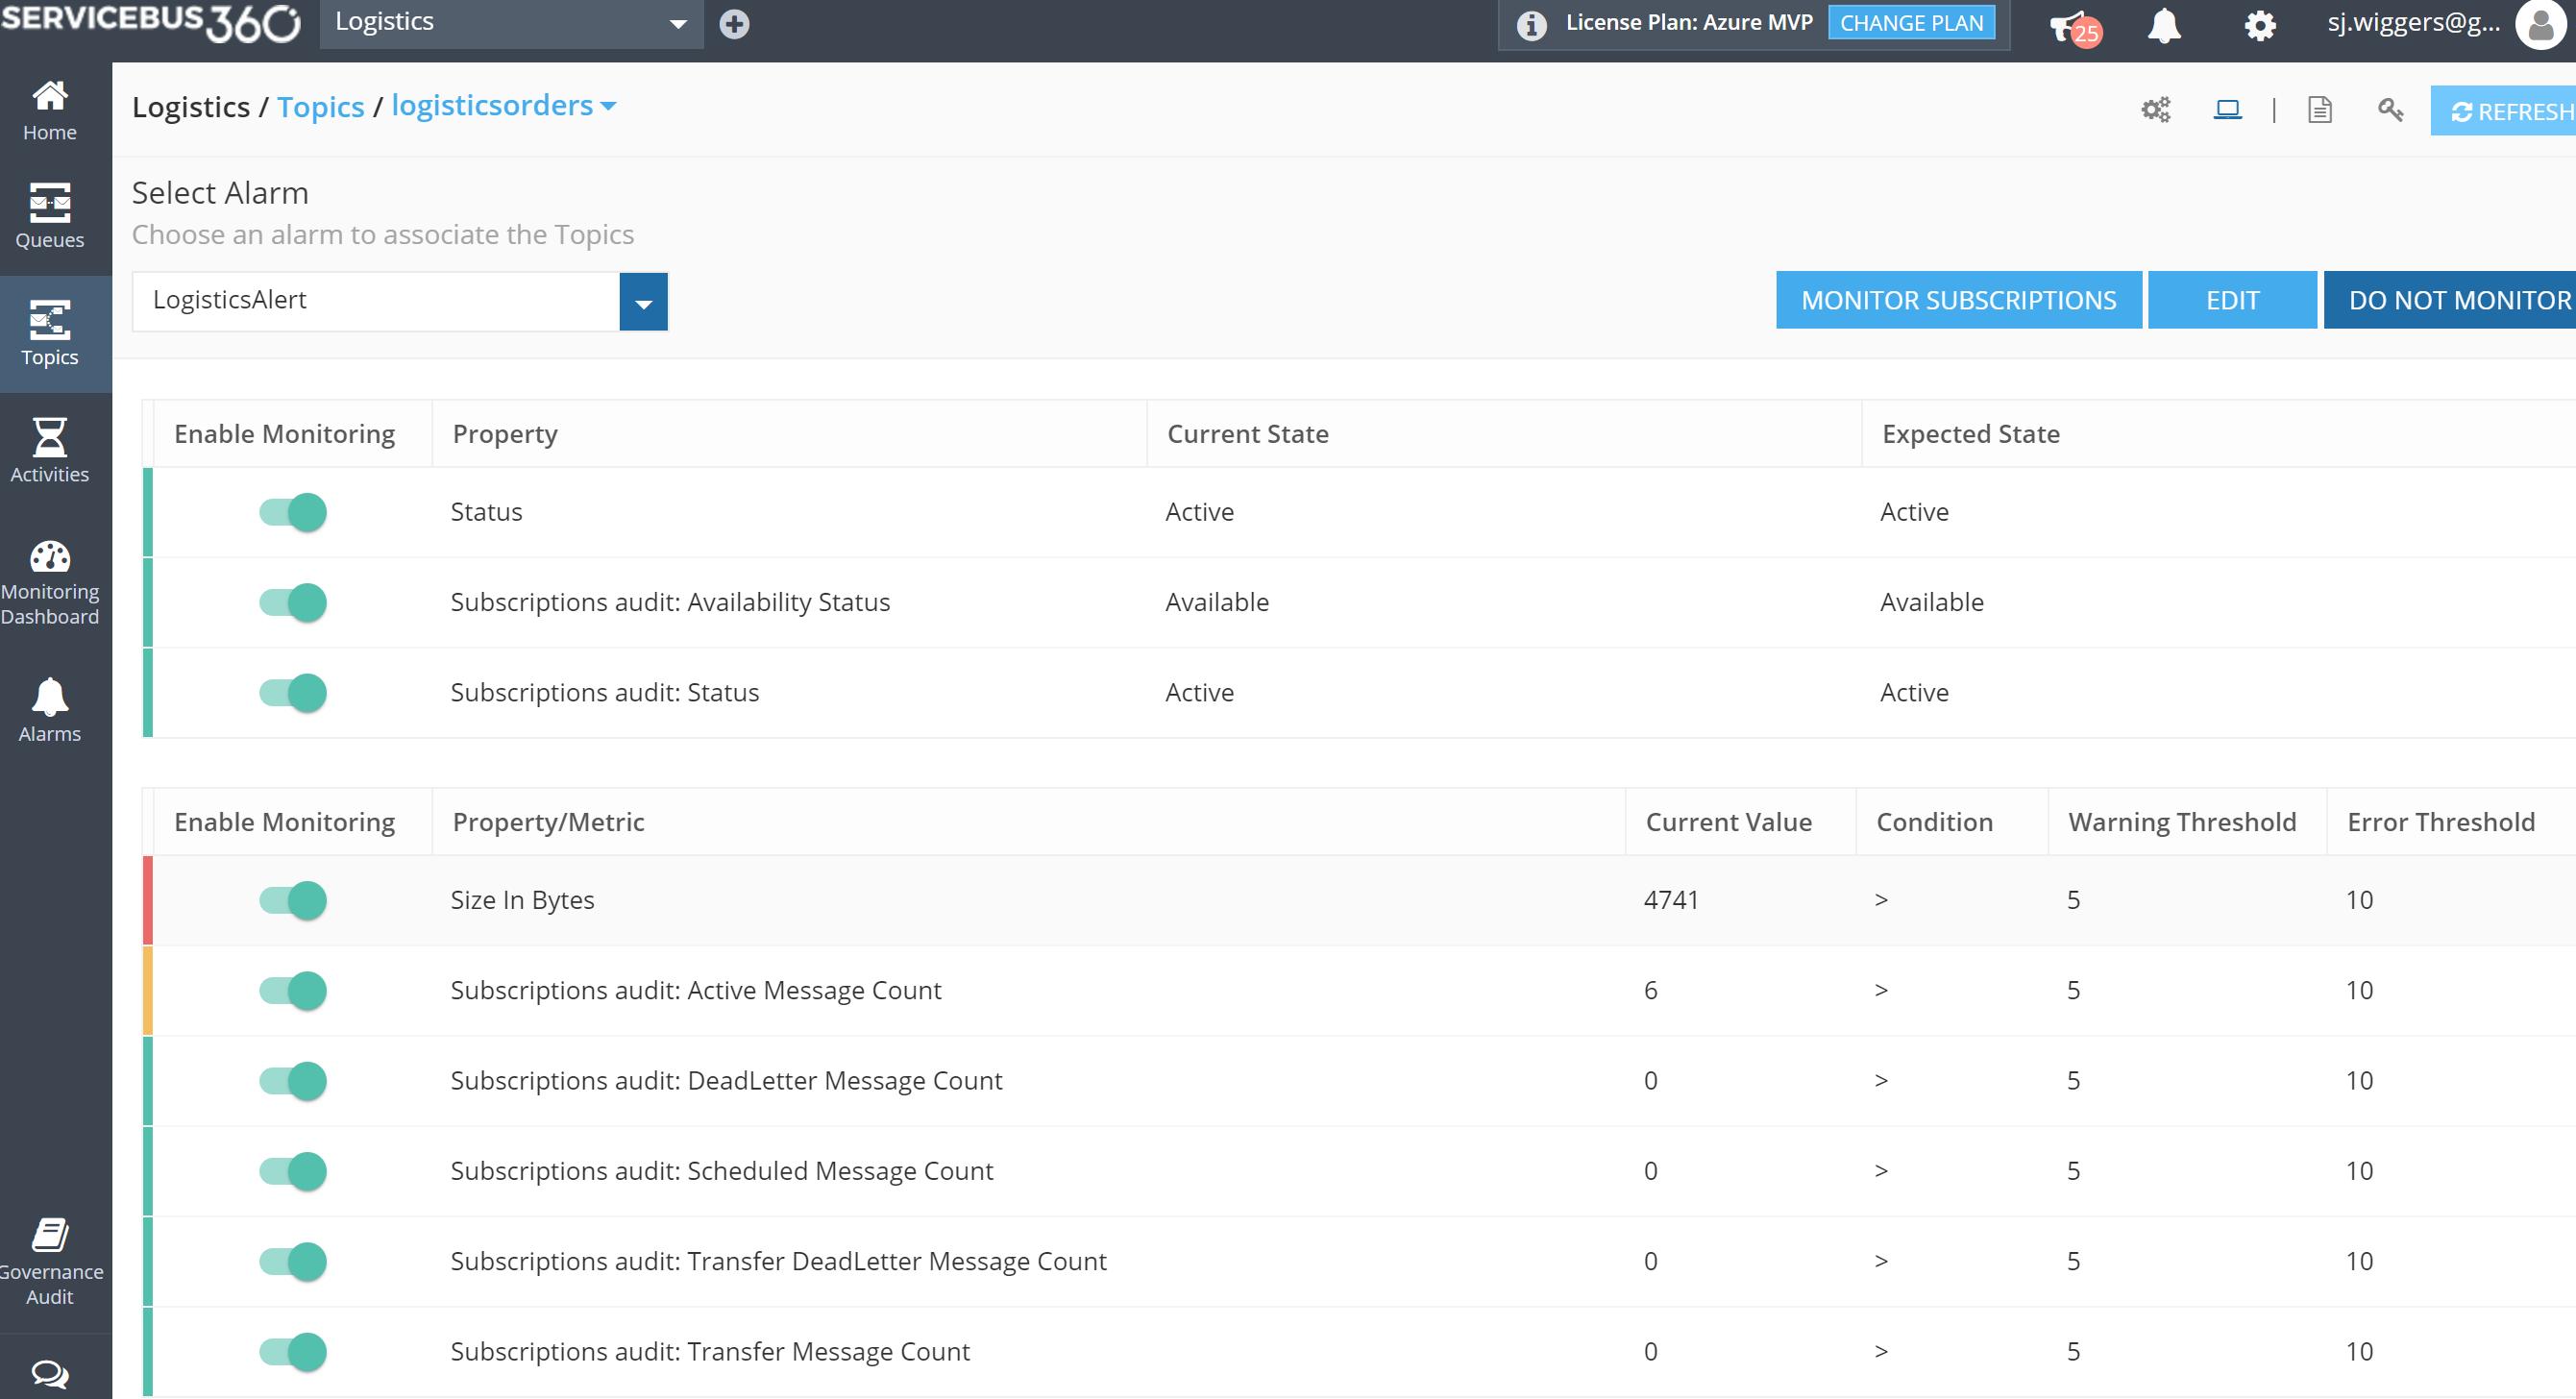 monitoring namespaces using servicebus360